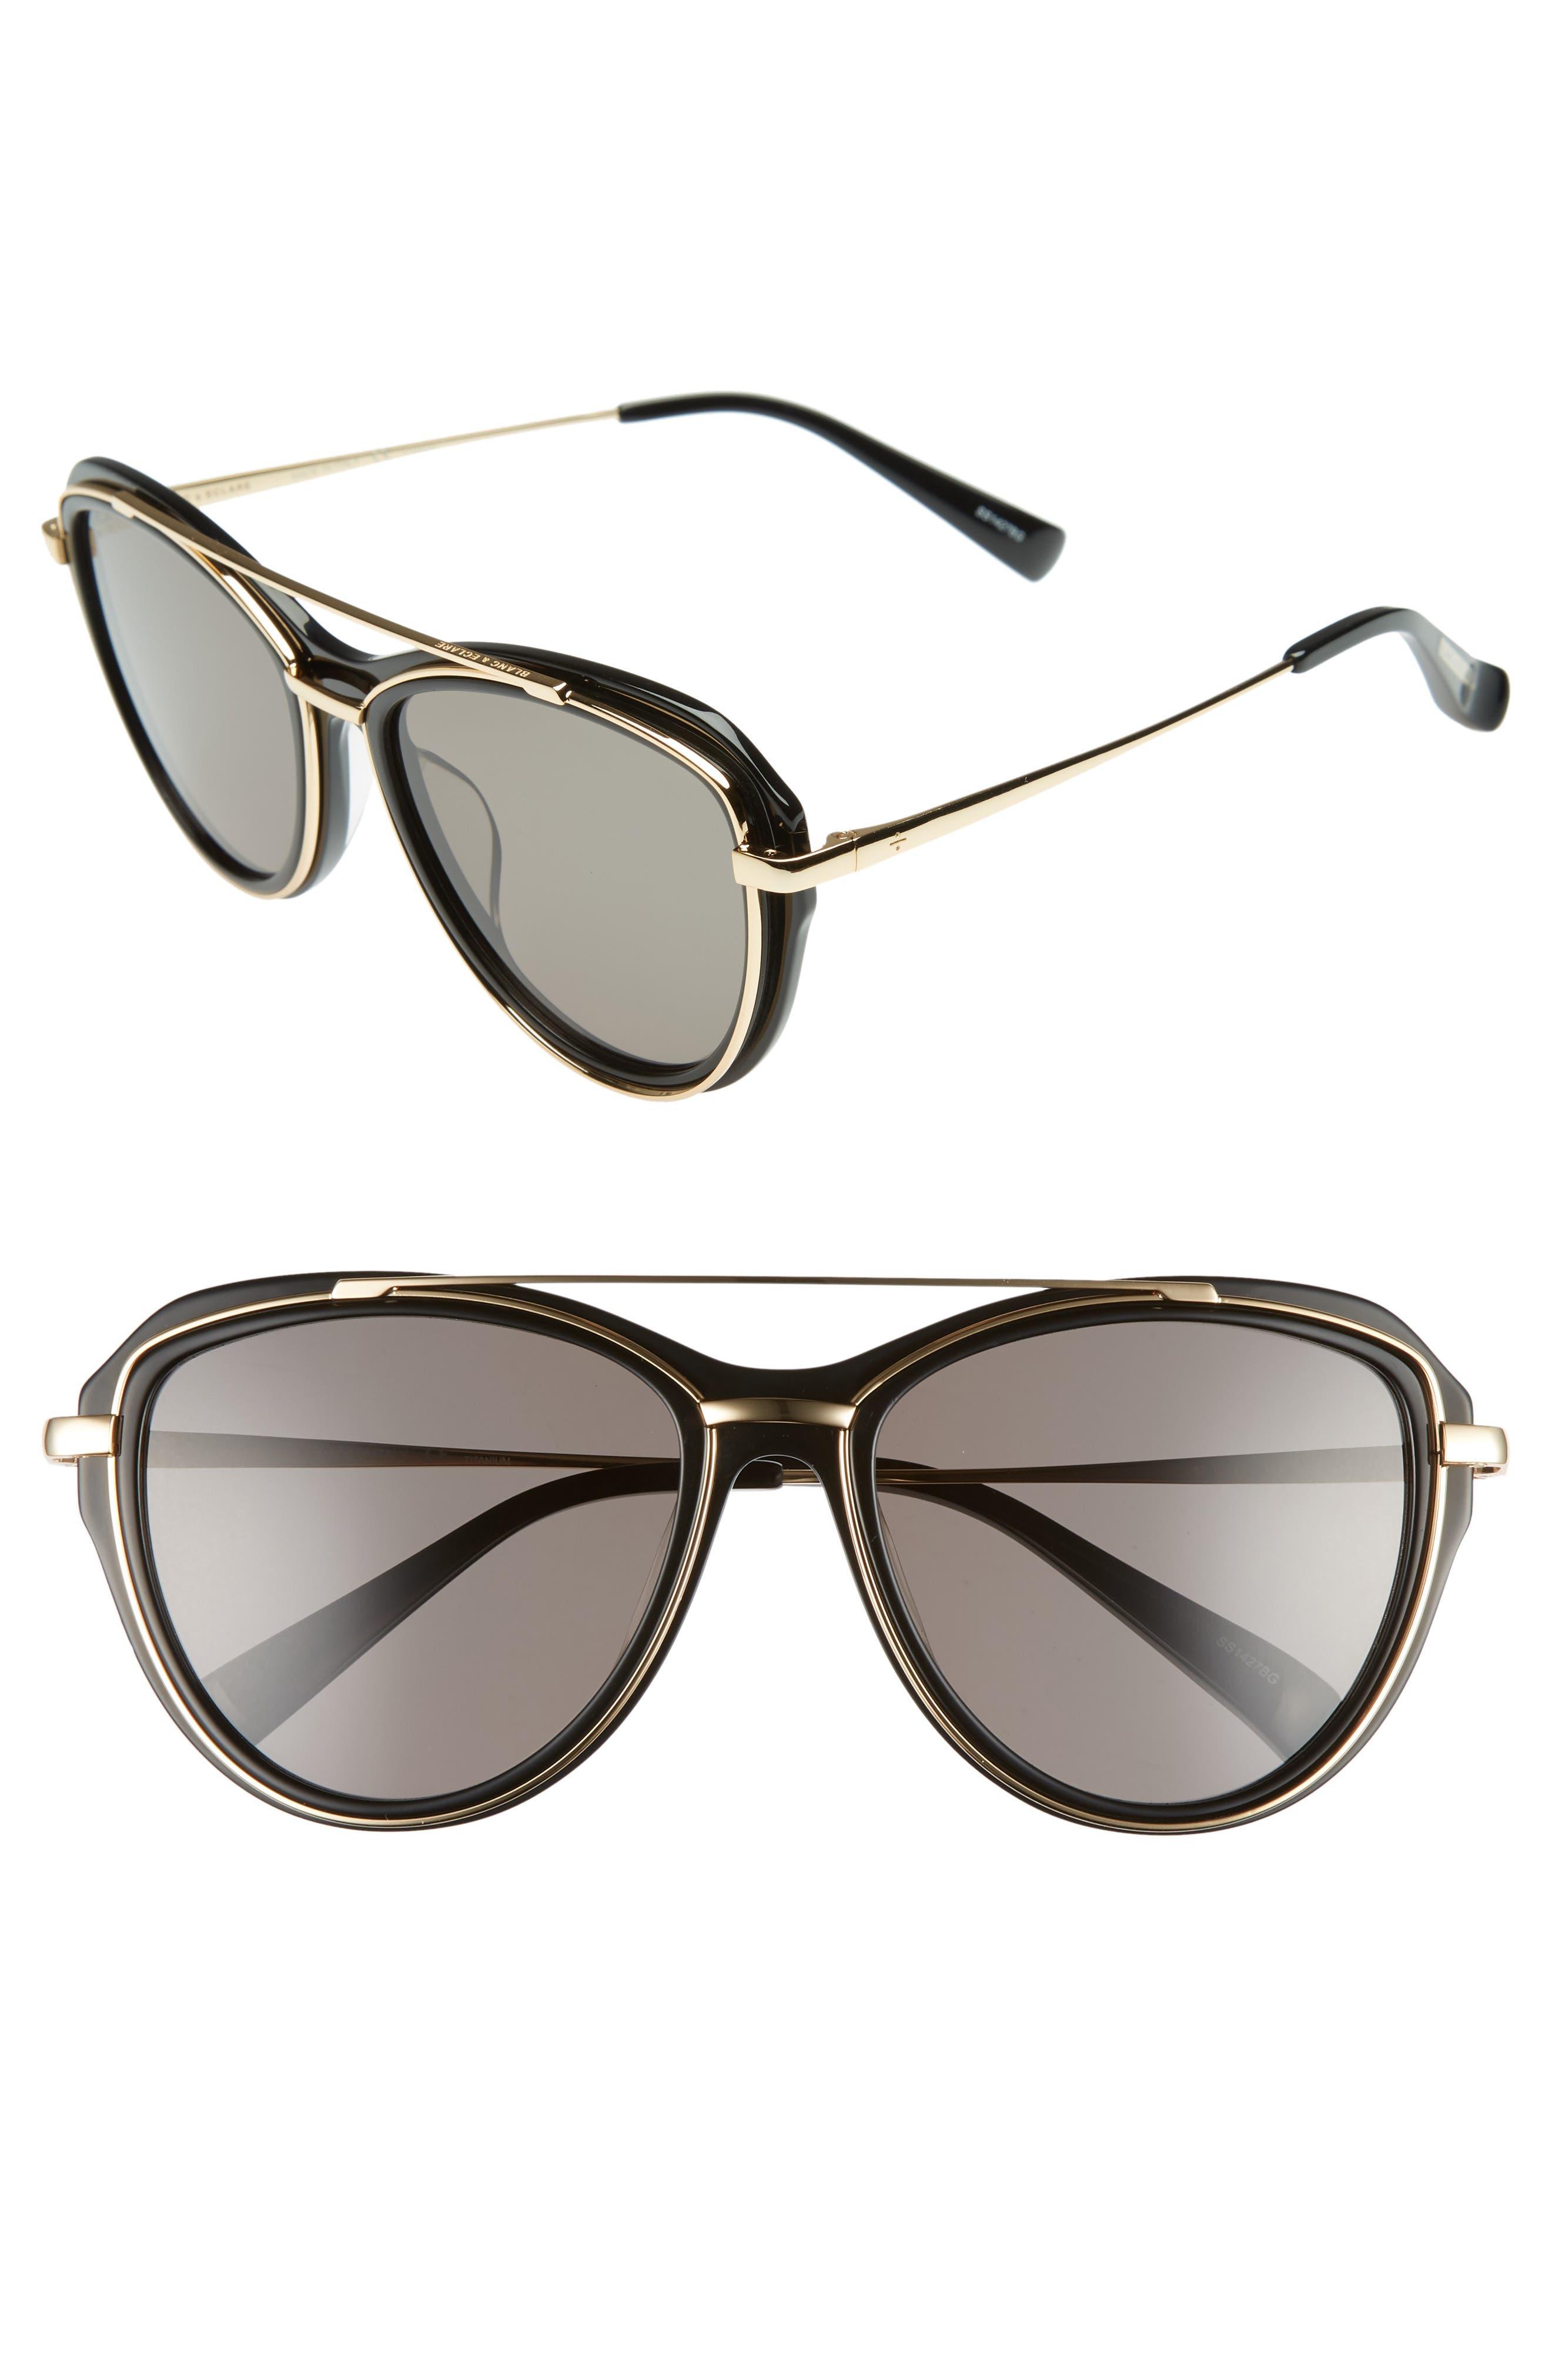 BLANC & ECLARE Marrakesh 57mm Aviator Sunglasses,                             Main thumbnail 1, color,                             001